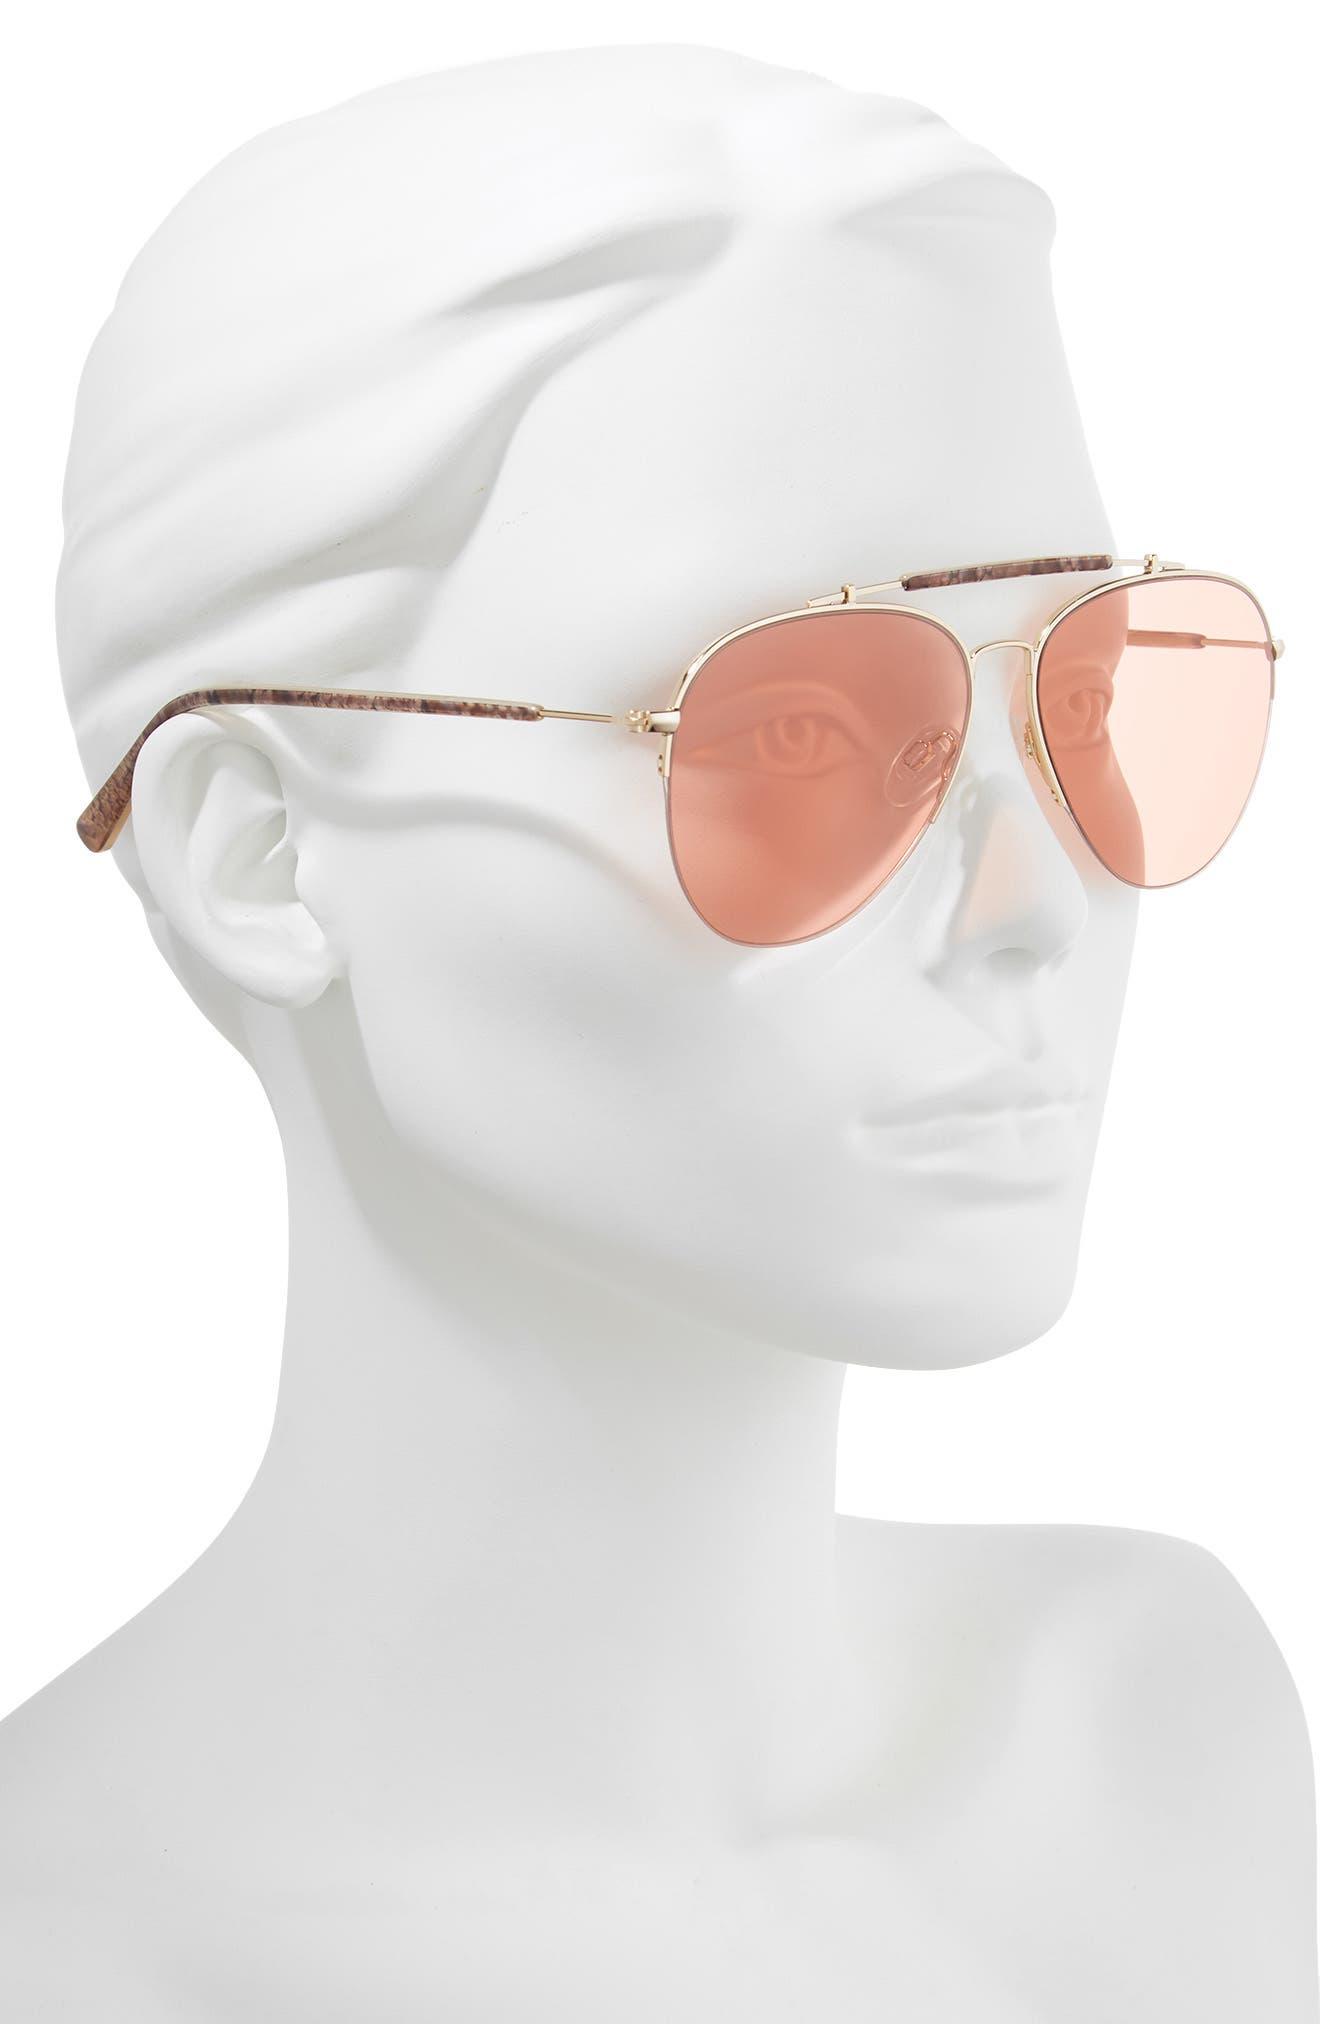 D'BLANC x Amuse Society The Last 58mm Aviator Sunglasses,                             Alternate thumbnail 2, color,                             Rattlesnake/ Persimmon